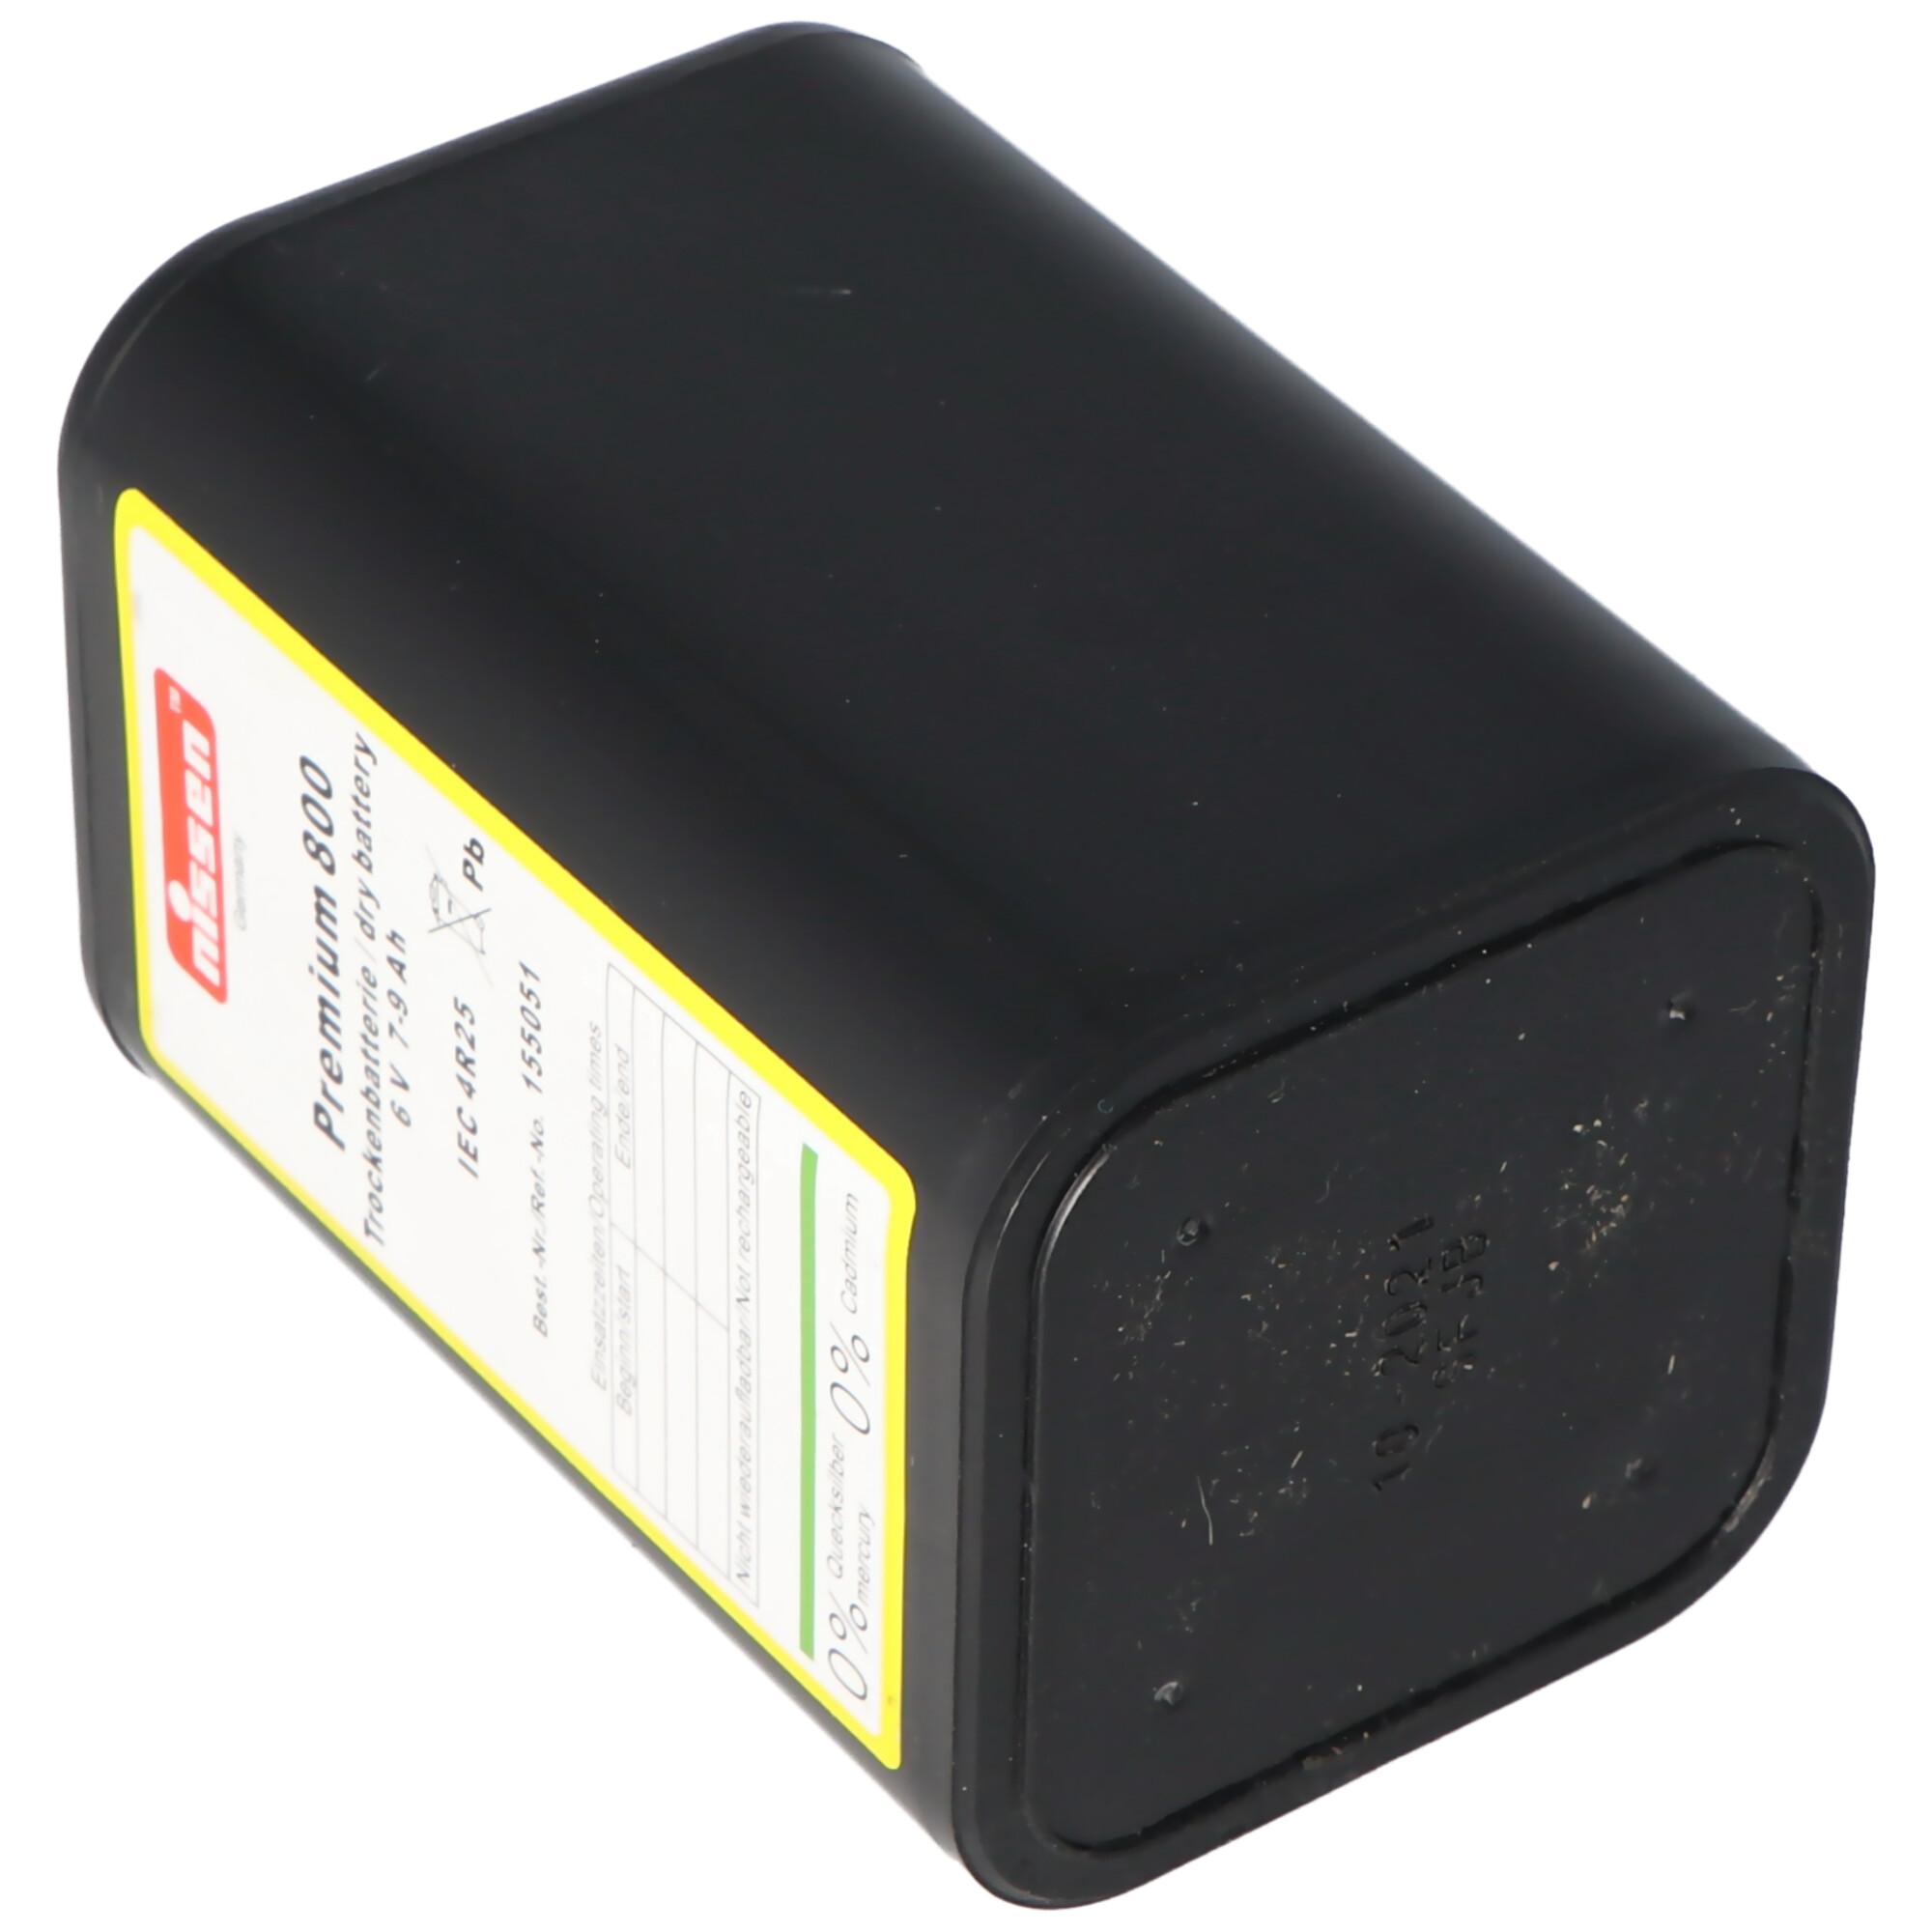 Nissen 4R25 Premium 800 6V 7-9Ah Dry Battery 6 Volt FOR SITE LIGHTS